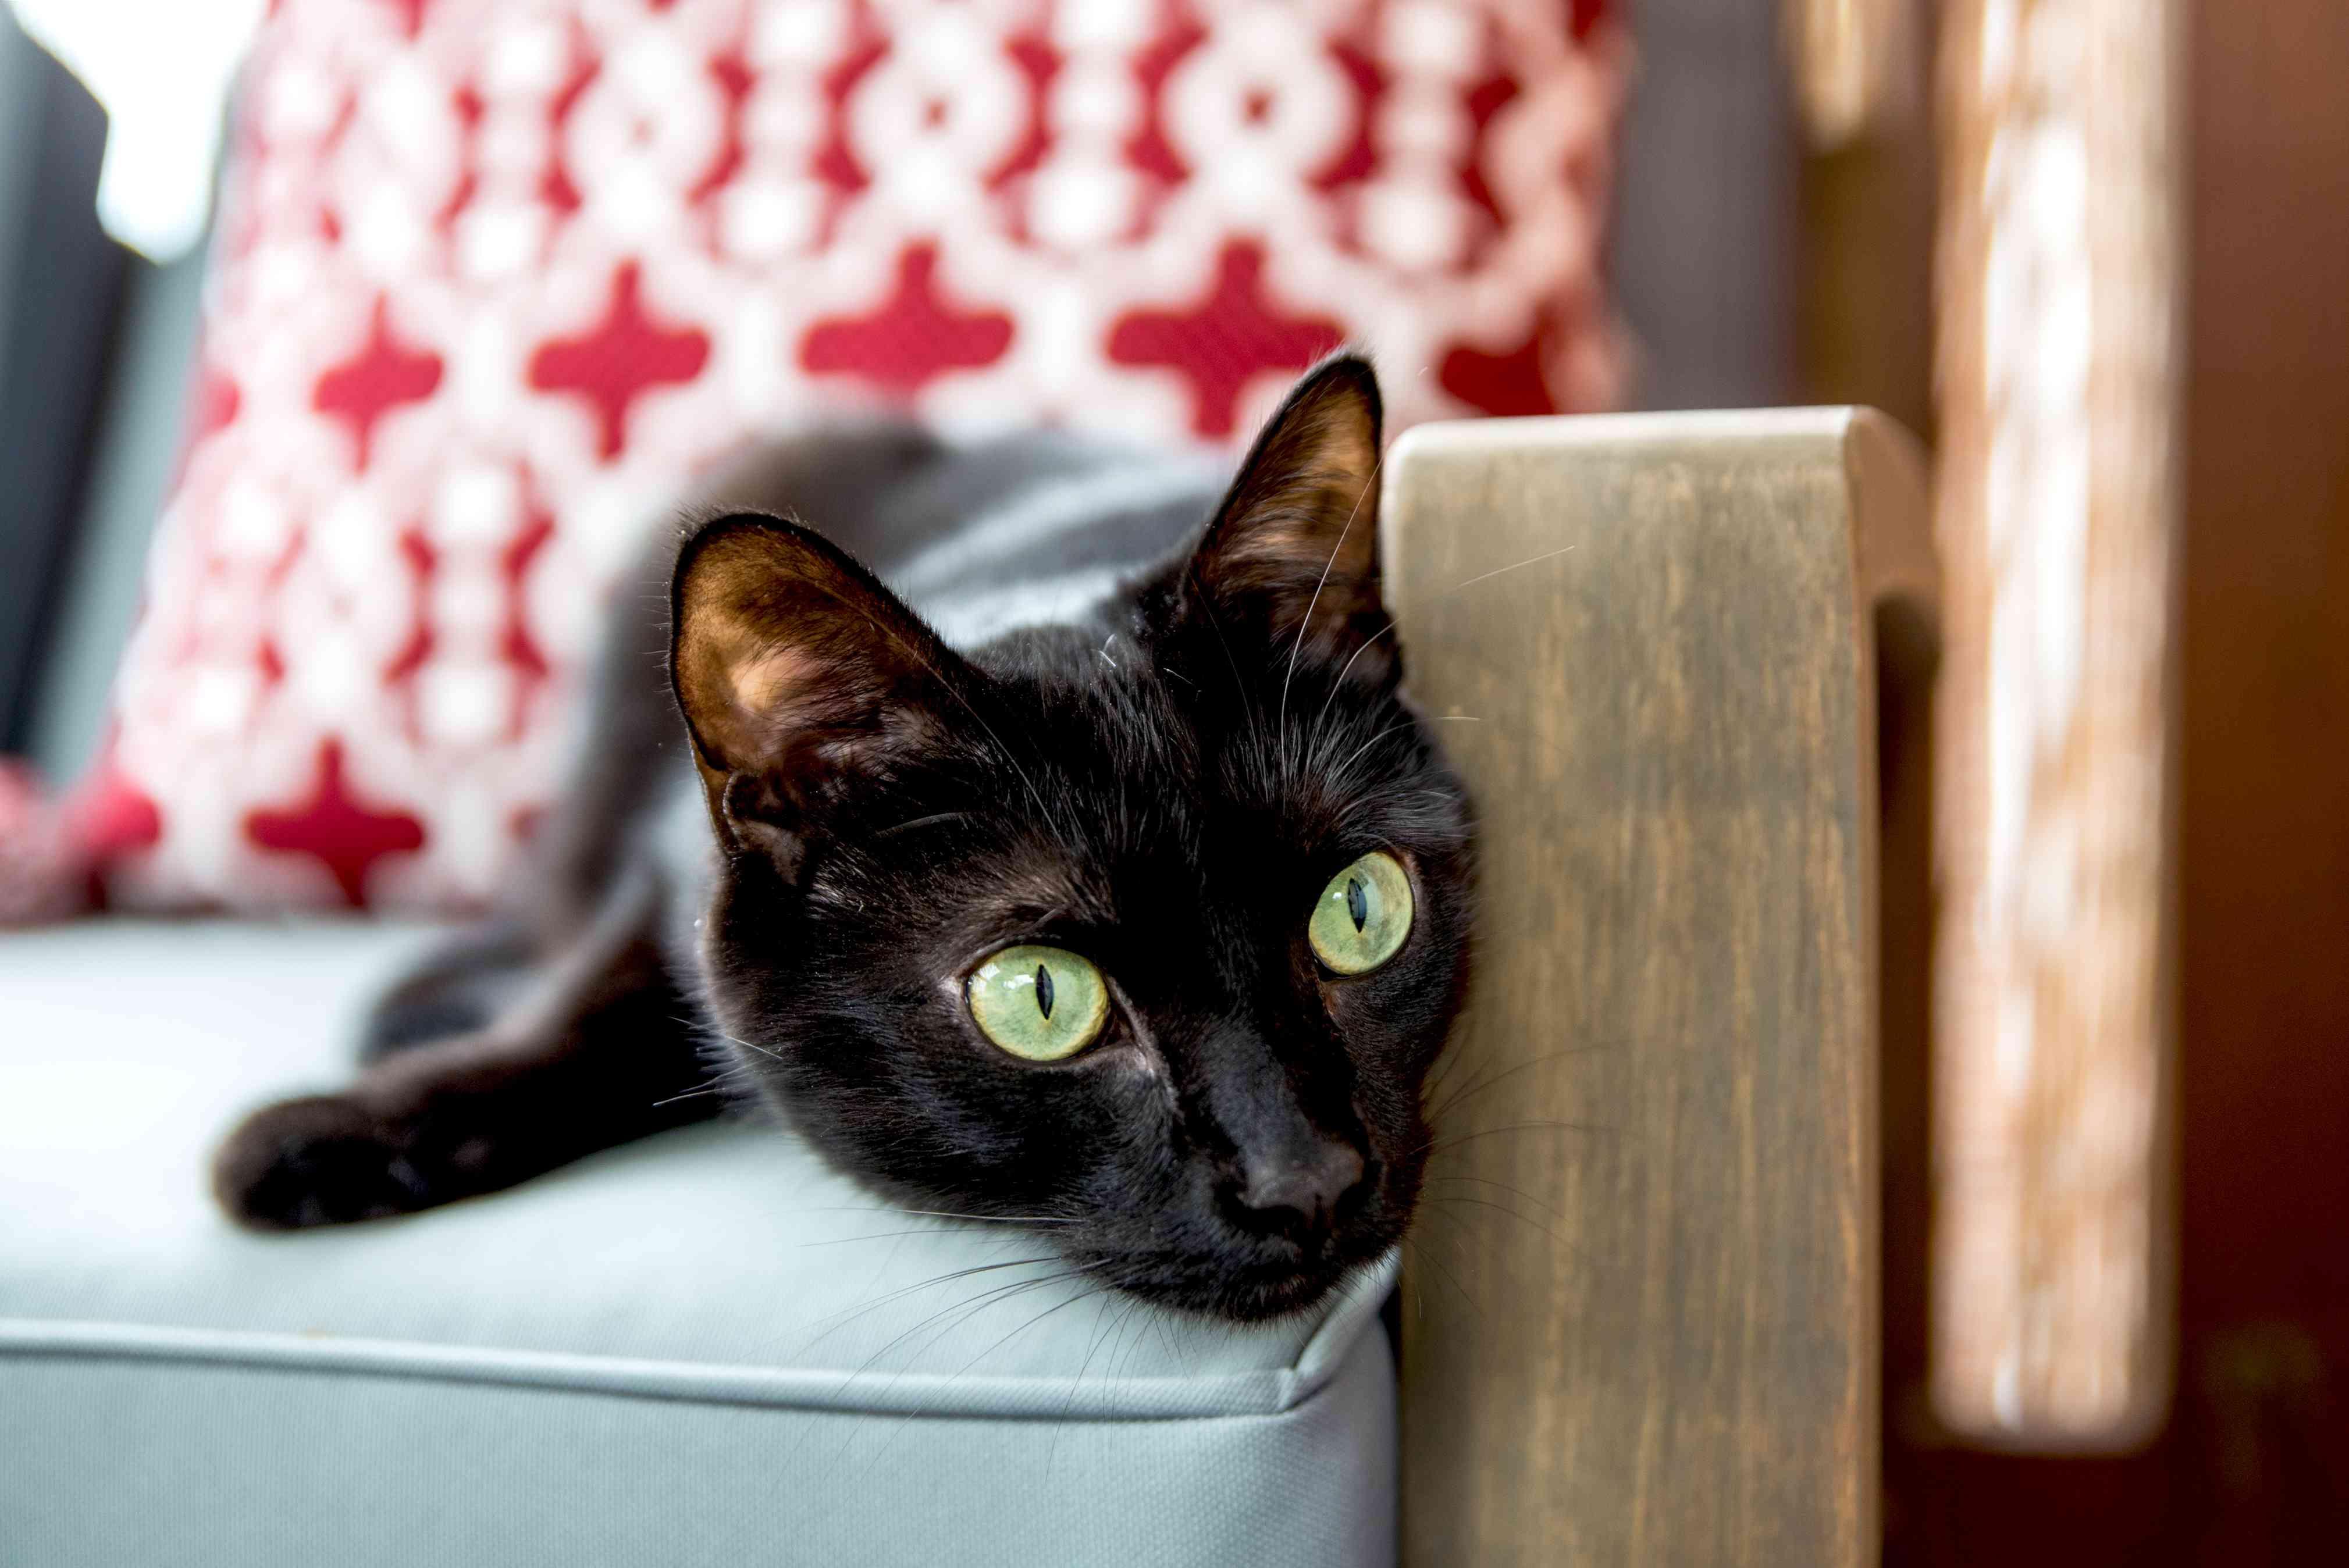 kitty on a canvas chair